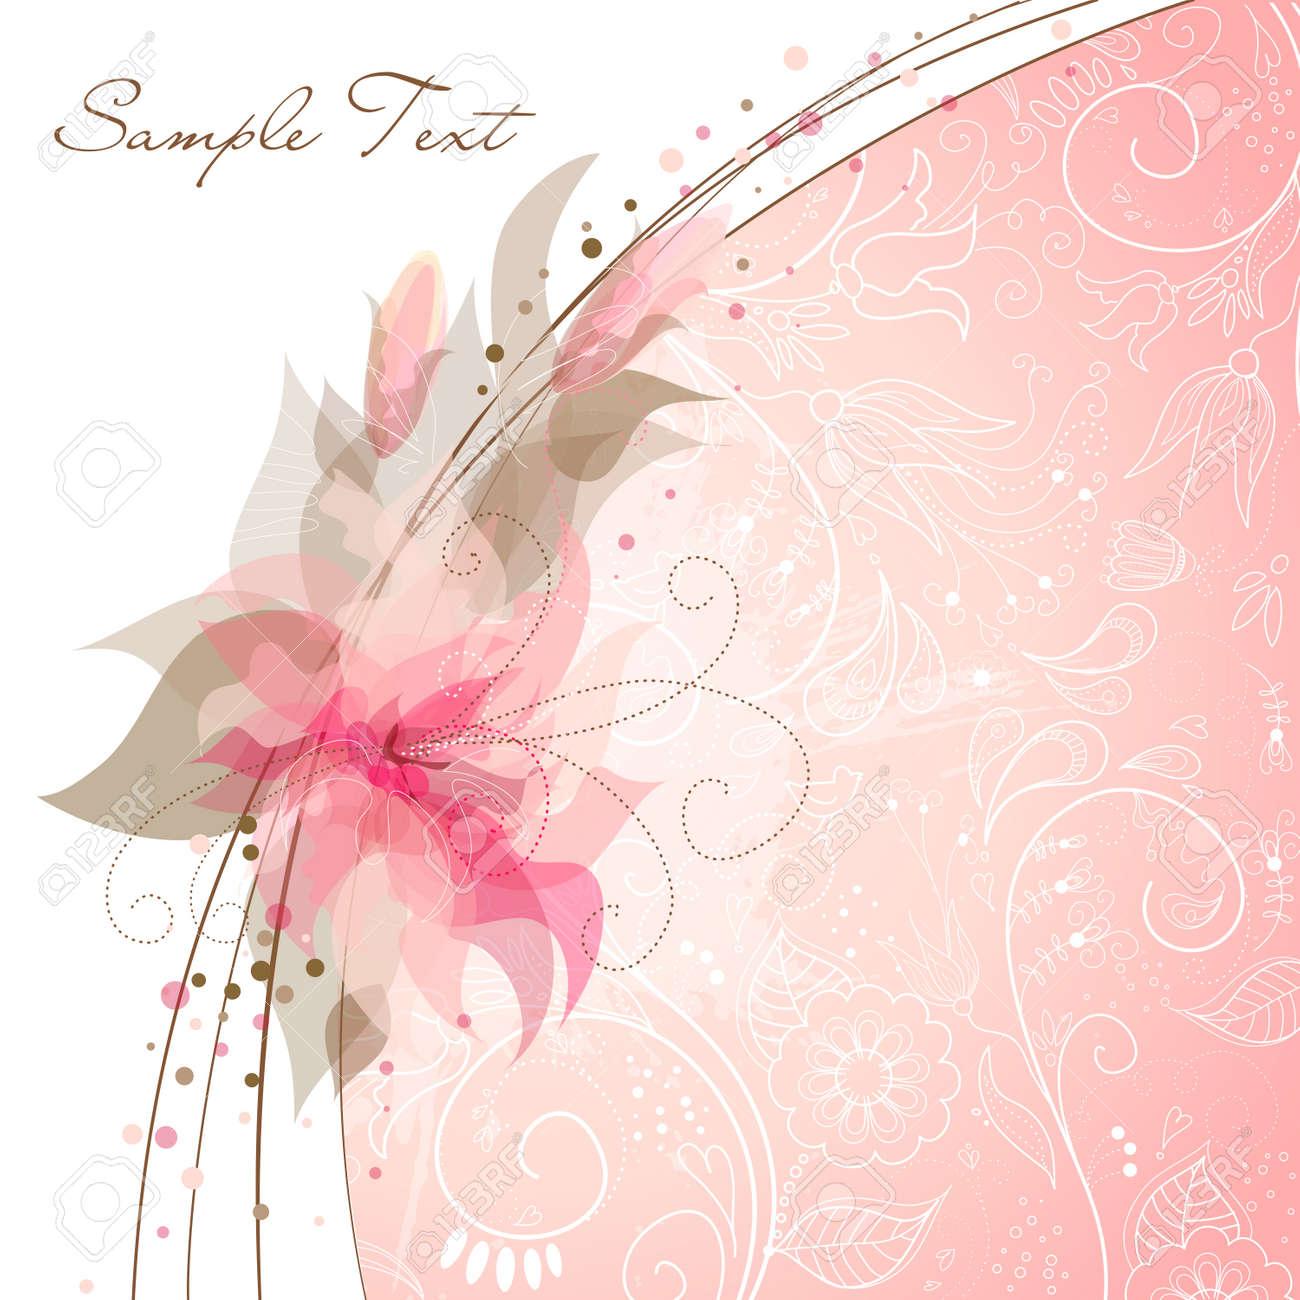 Romantic Flower Background Stock Vector - 12494221